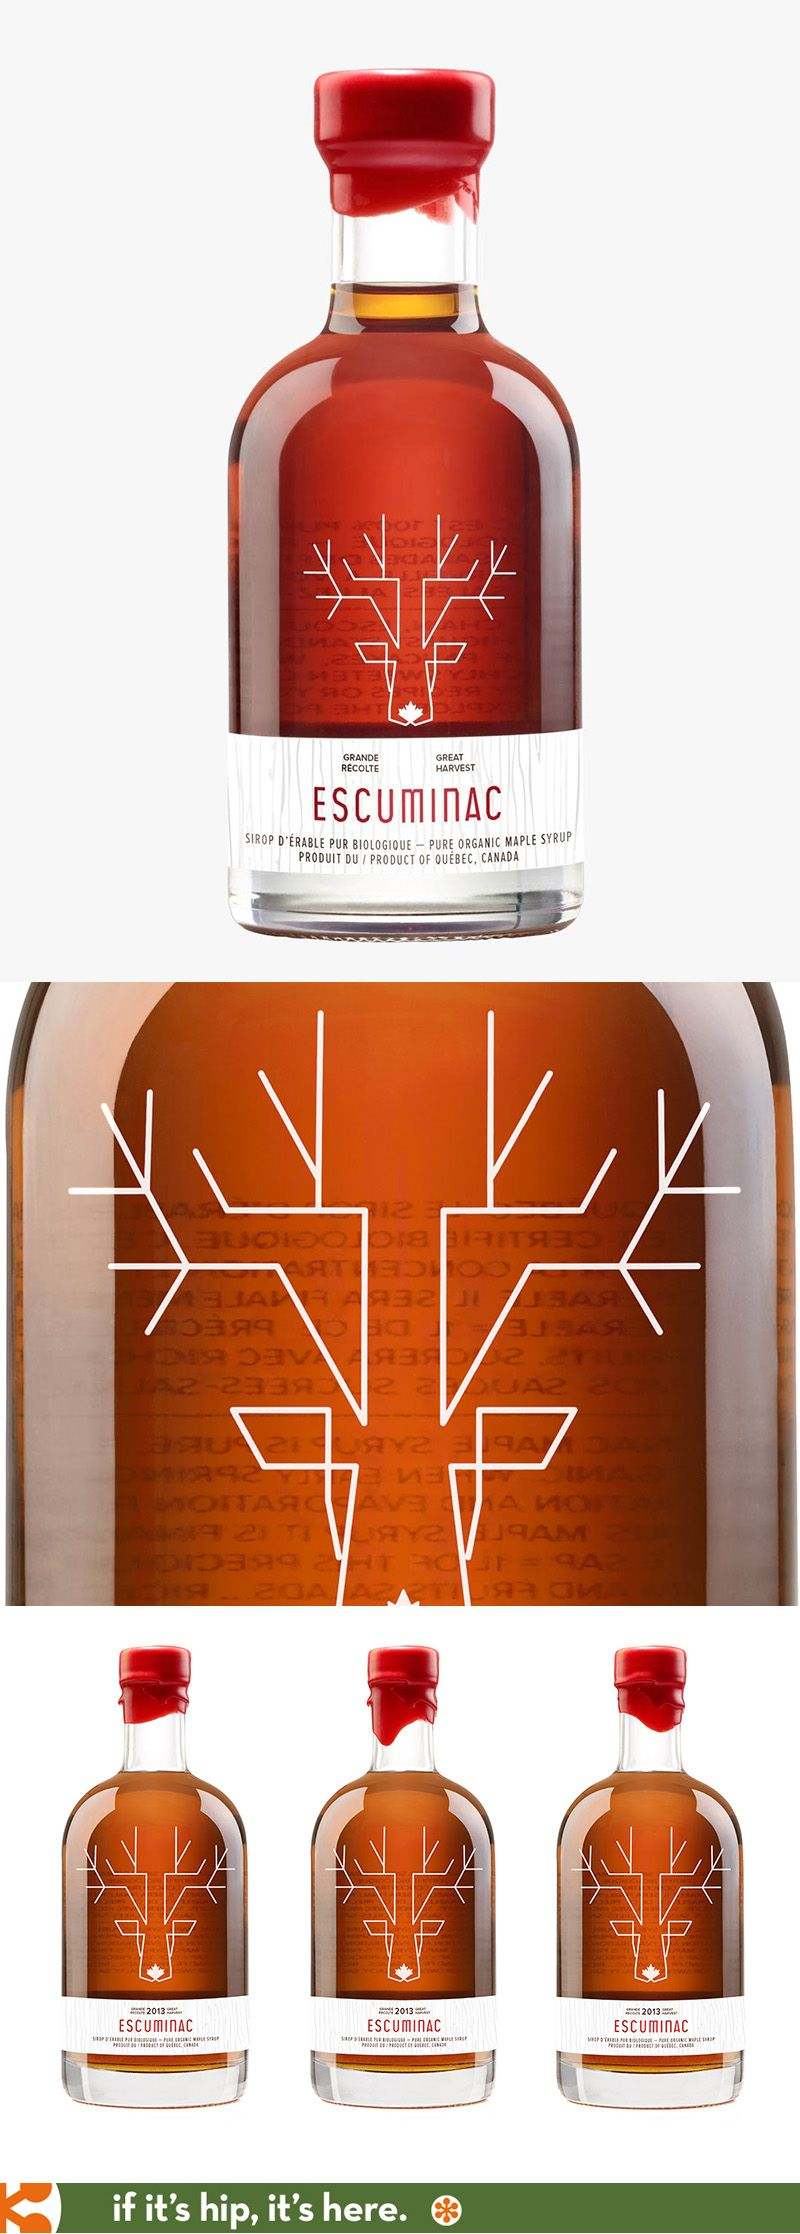 Escuminac Erable Merisier Maple Birch With Beautiful Bottle Design By Chez Valois Bottle Label Design